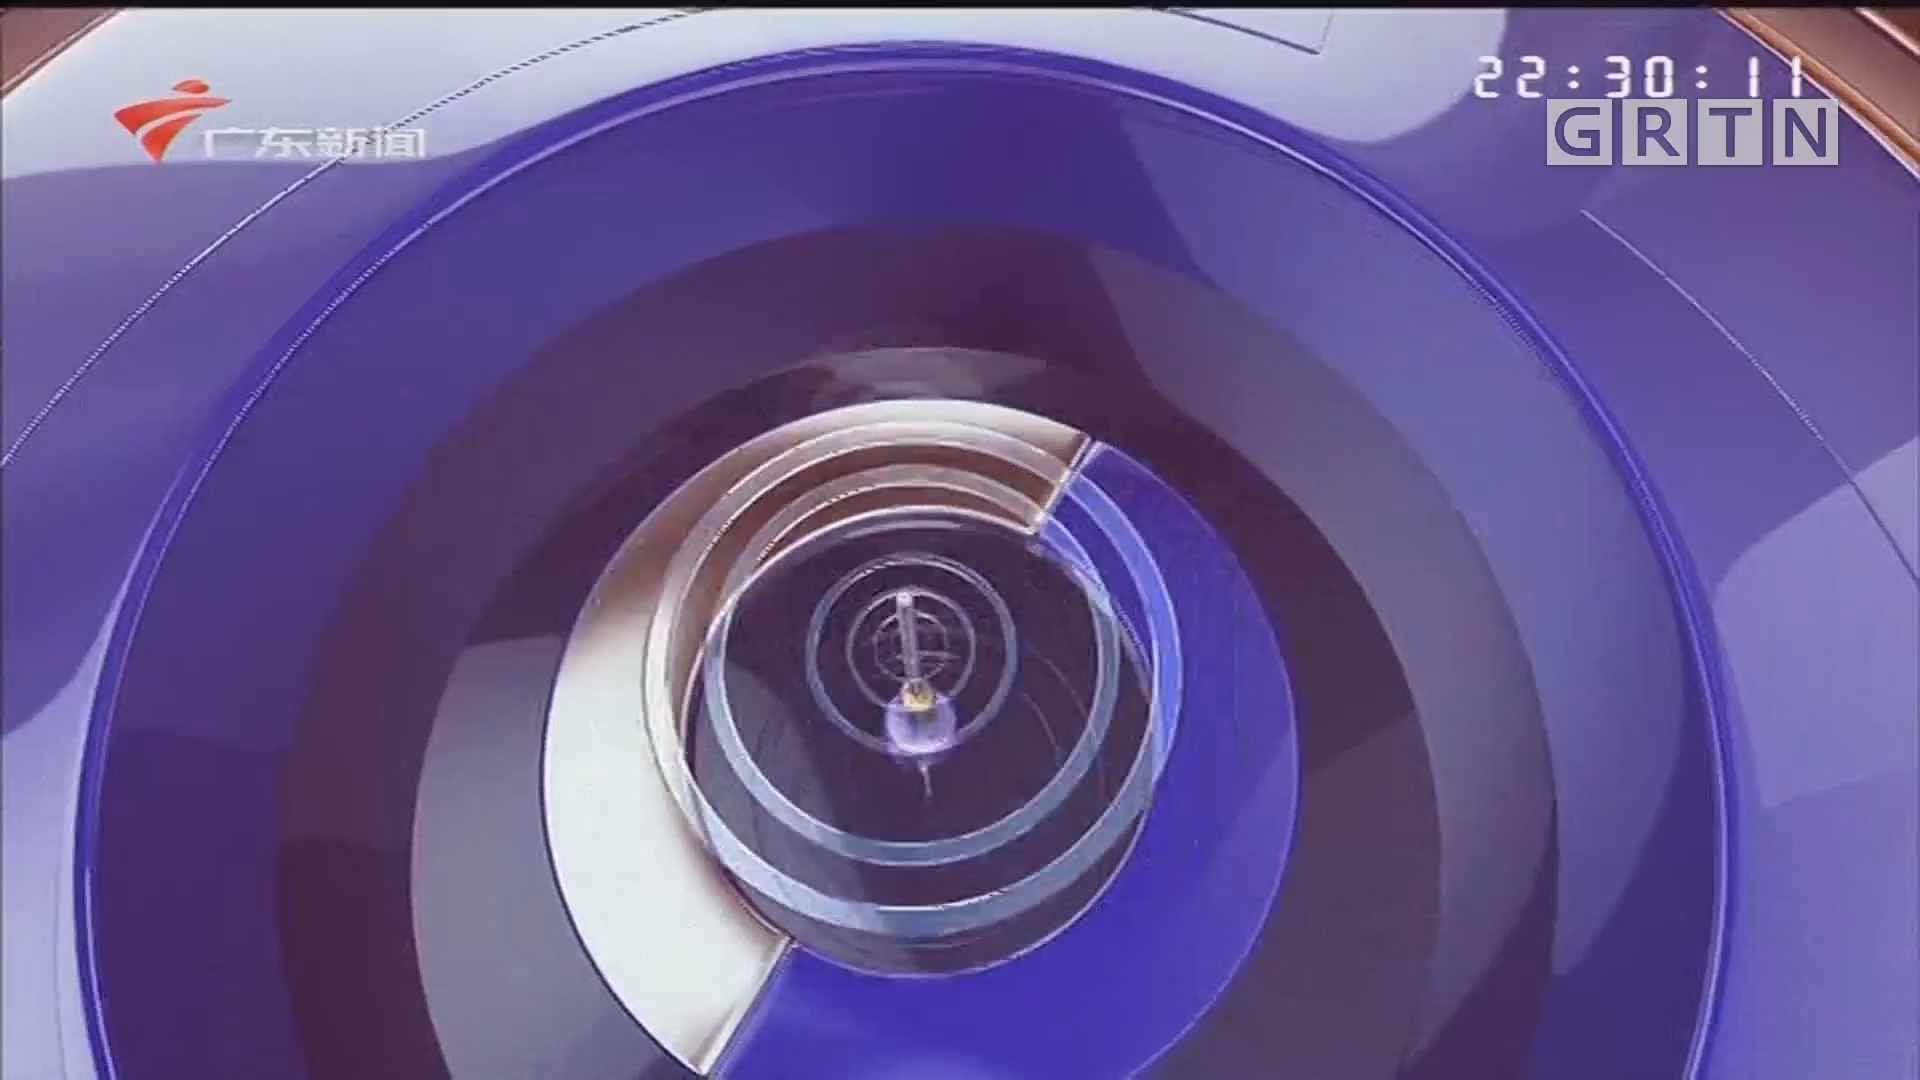 [HD][2020-01-26]新闻夜线:李克强主持召开中央应对新型冠状病毒感染肺炎疫情工作领导小组会议 贯彻习近平总书记重要讲话和中央政治局常委会会议精神 进一步部署疫情防控工作